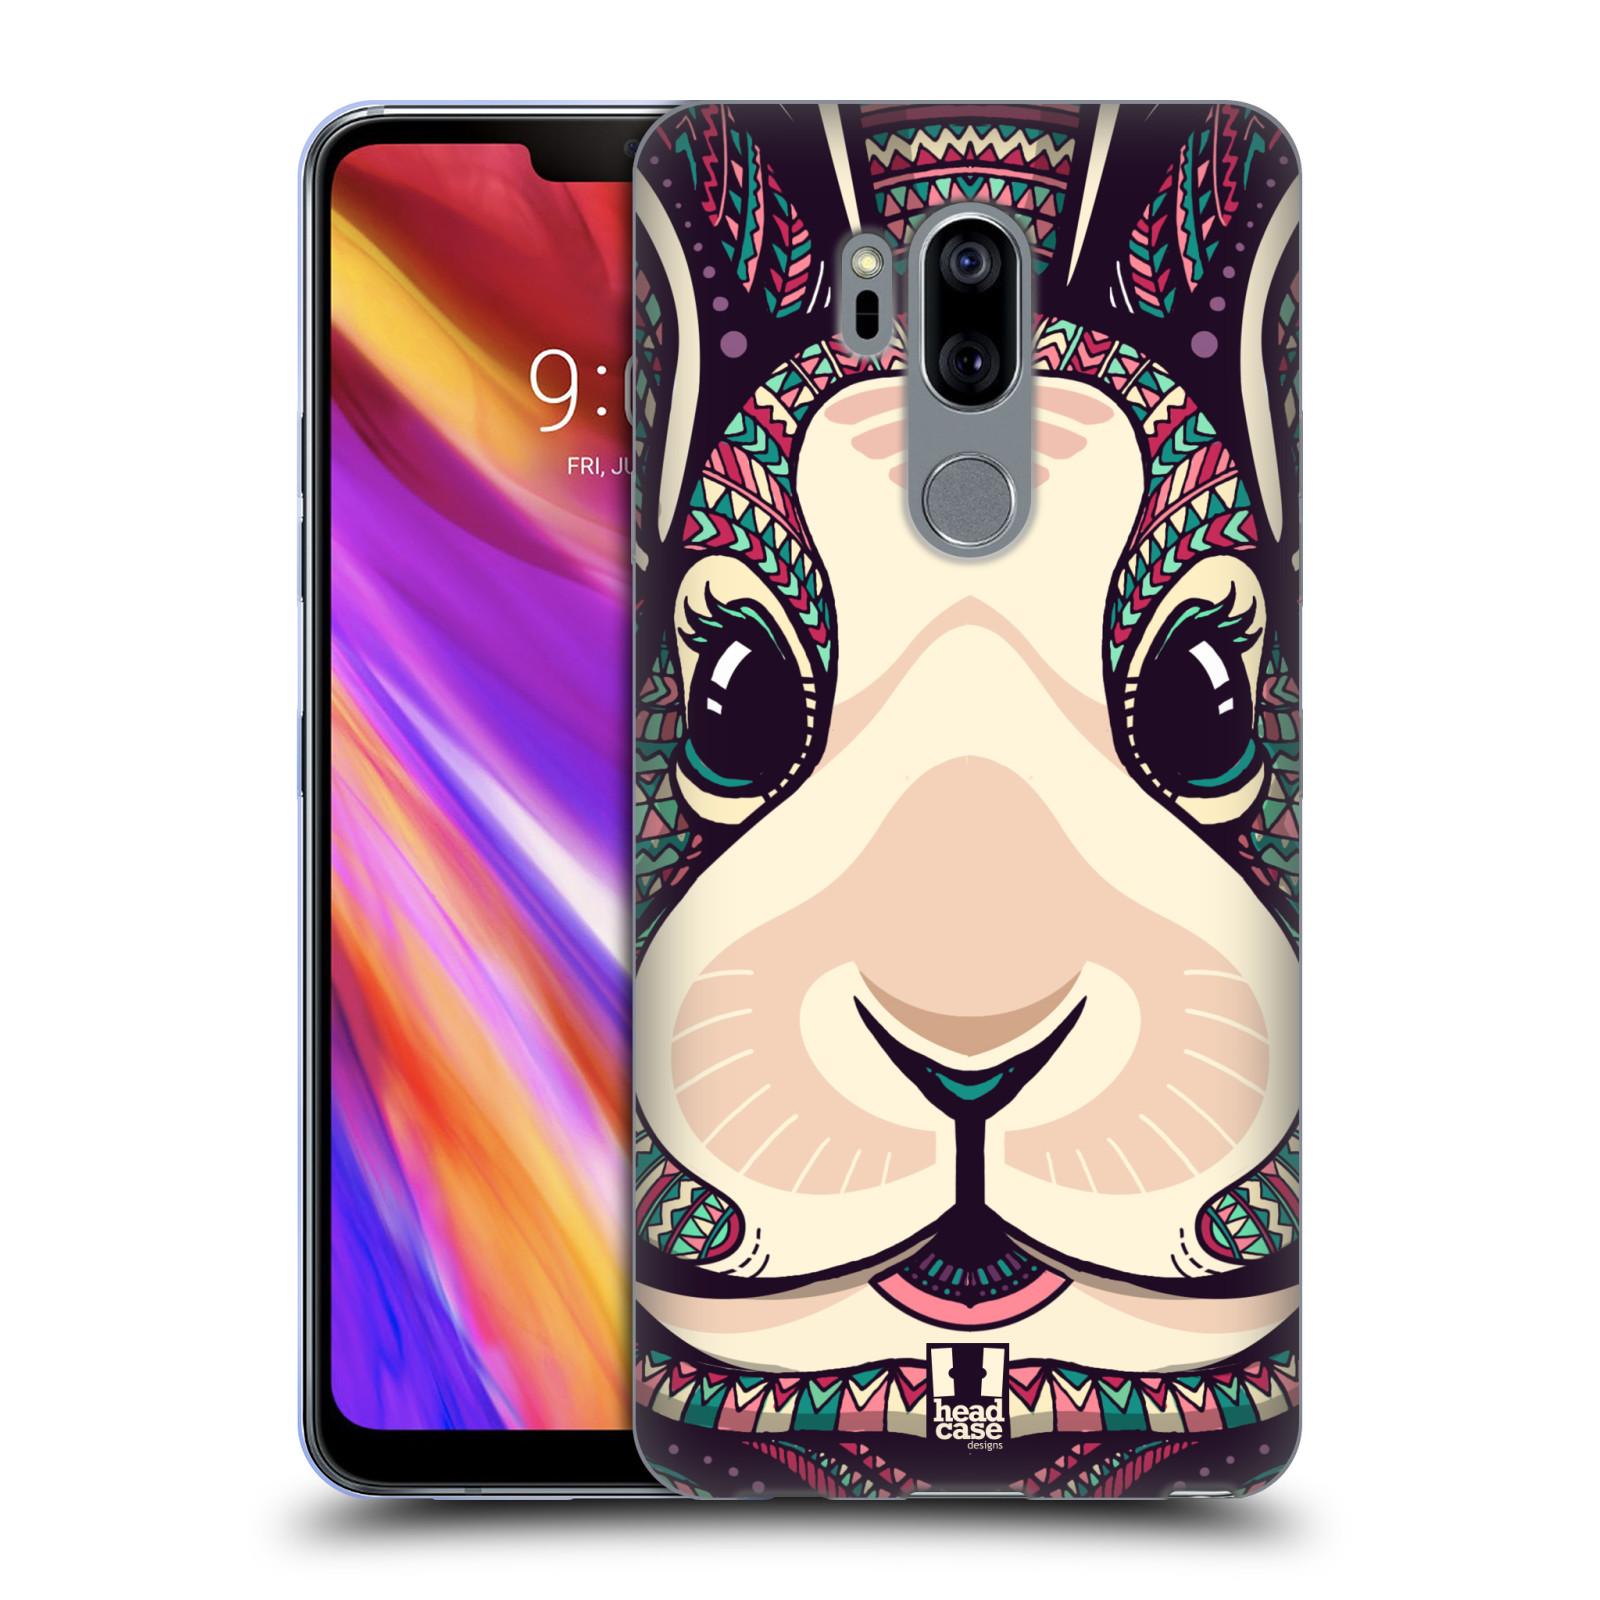 Silikonové pouzdro na mobil LG G7 ThinQ - Head Case - AZTEC ZAJÍČEK